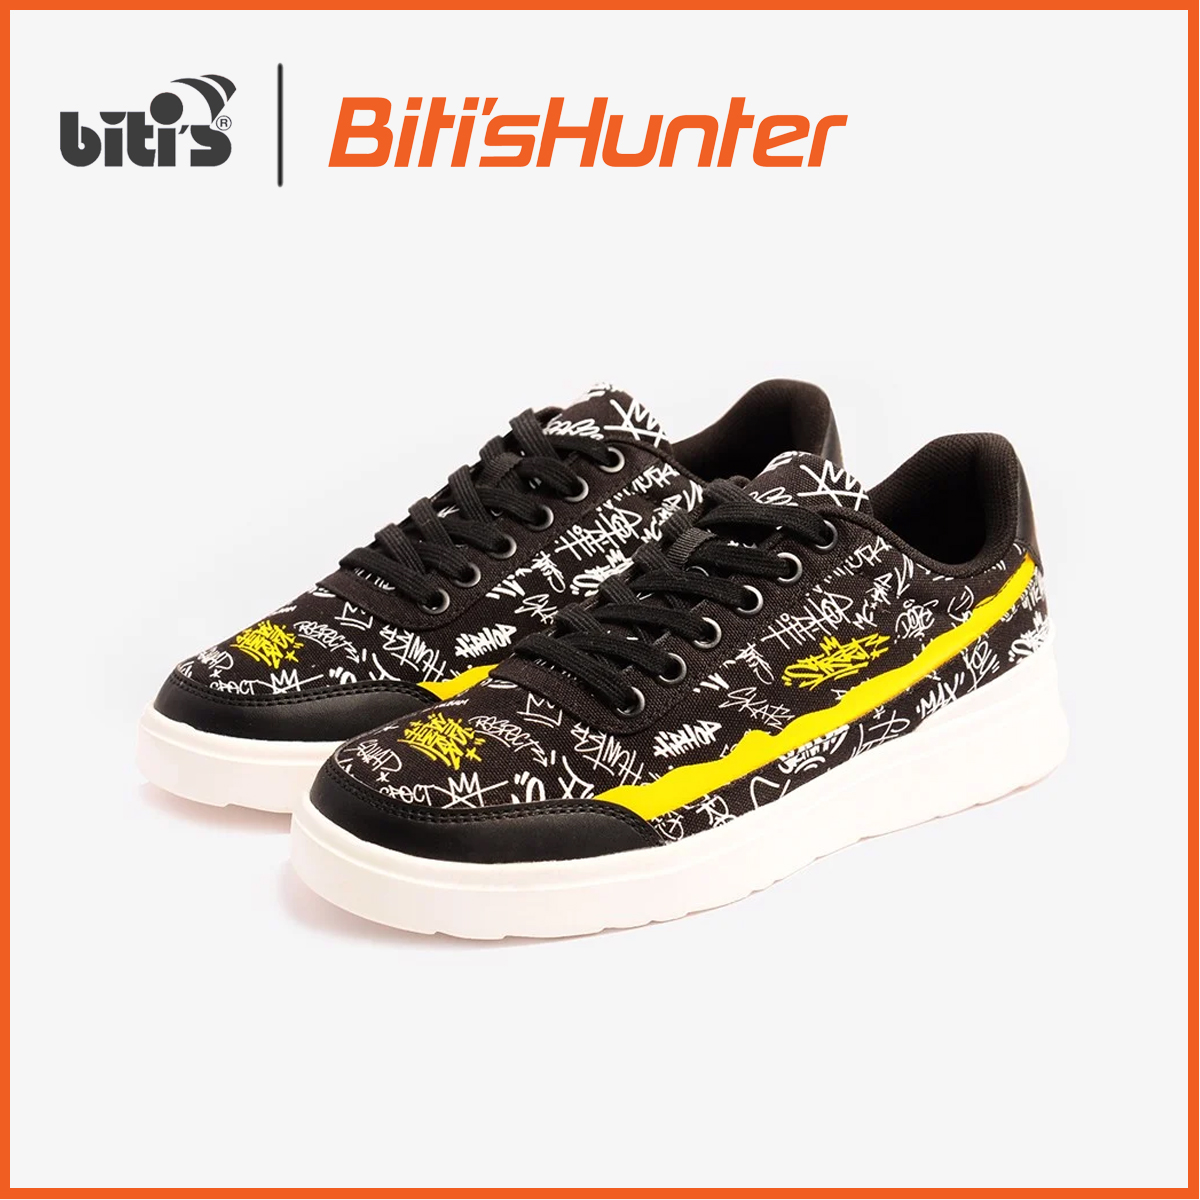 Giày Thể Thao Nữ Biti's Hunter Street VietMax Culture Black Wall DSWH02500DEN